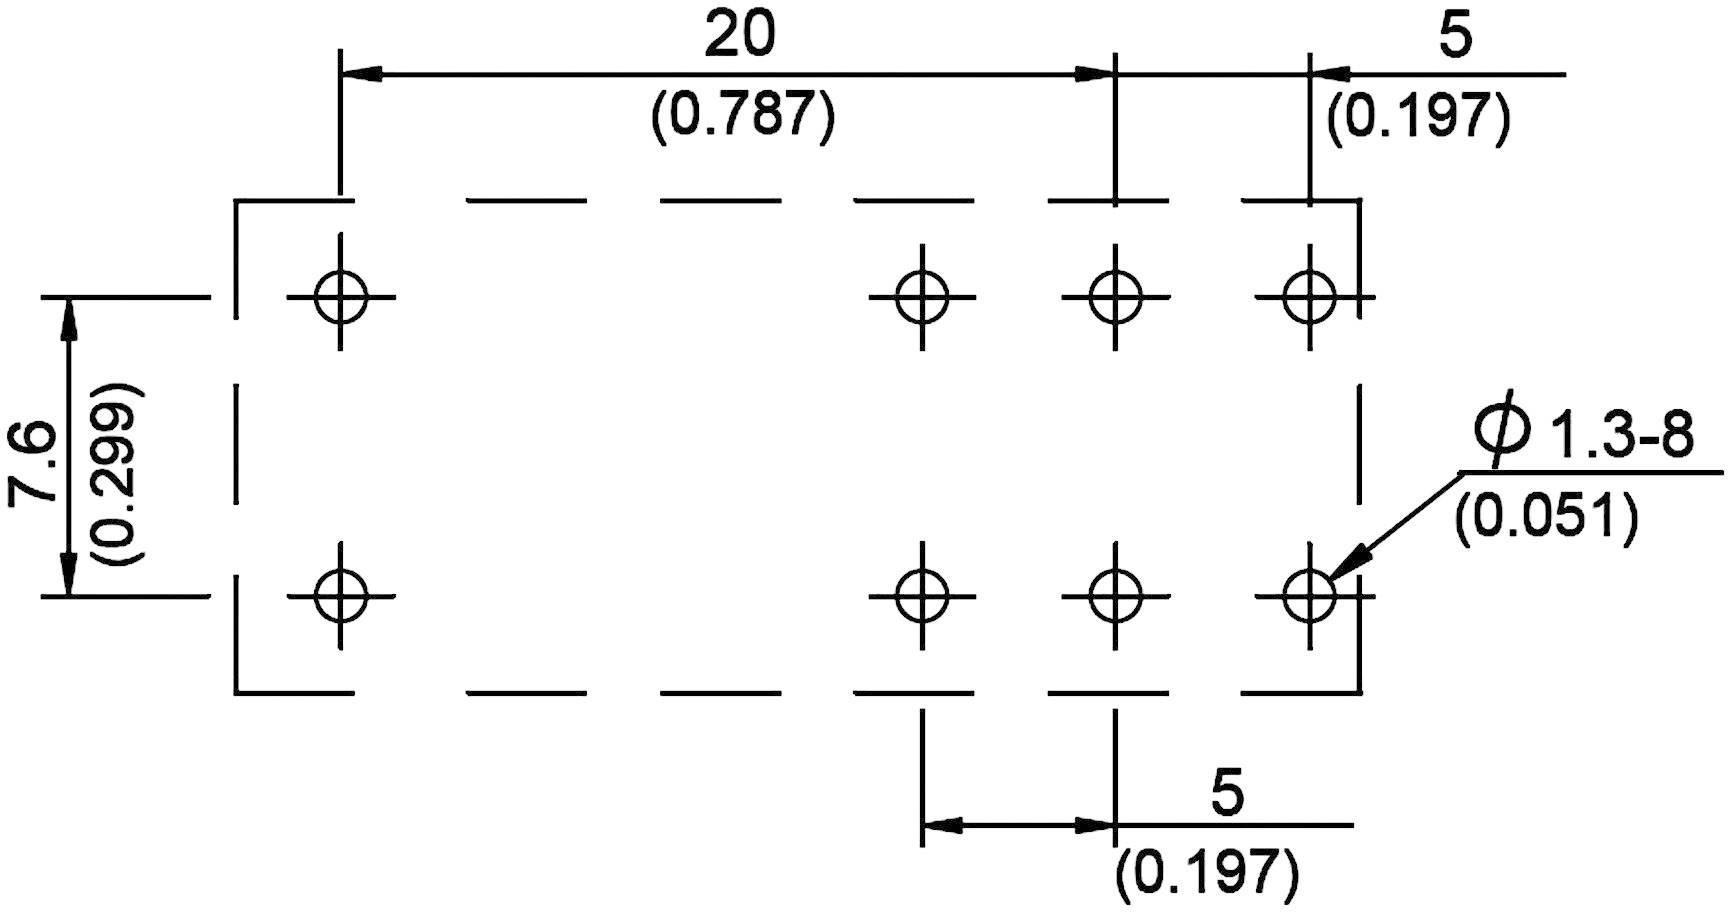 Zátěžové relé série 888 Song Chuan 888H-1CCFCE 220/240, 888H-1CCFCE 220/240, 0.75 VA, 17 A, 440 V/AC 4250 VA